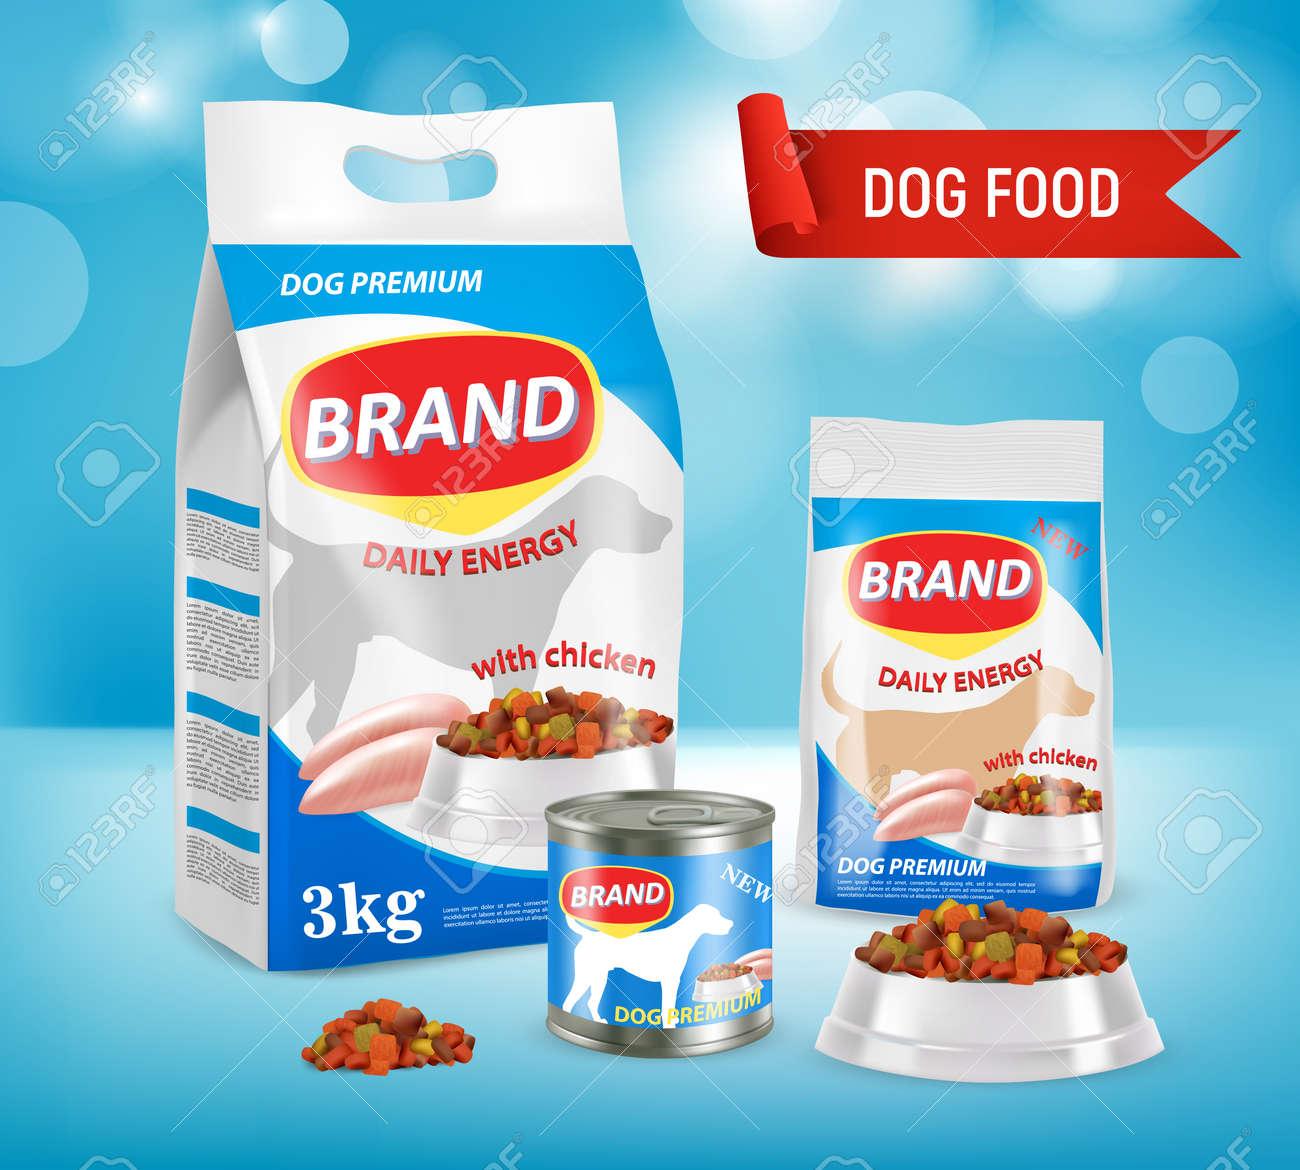 Dog food brand ad vector realistic illustration - 95826547